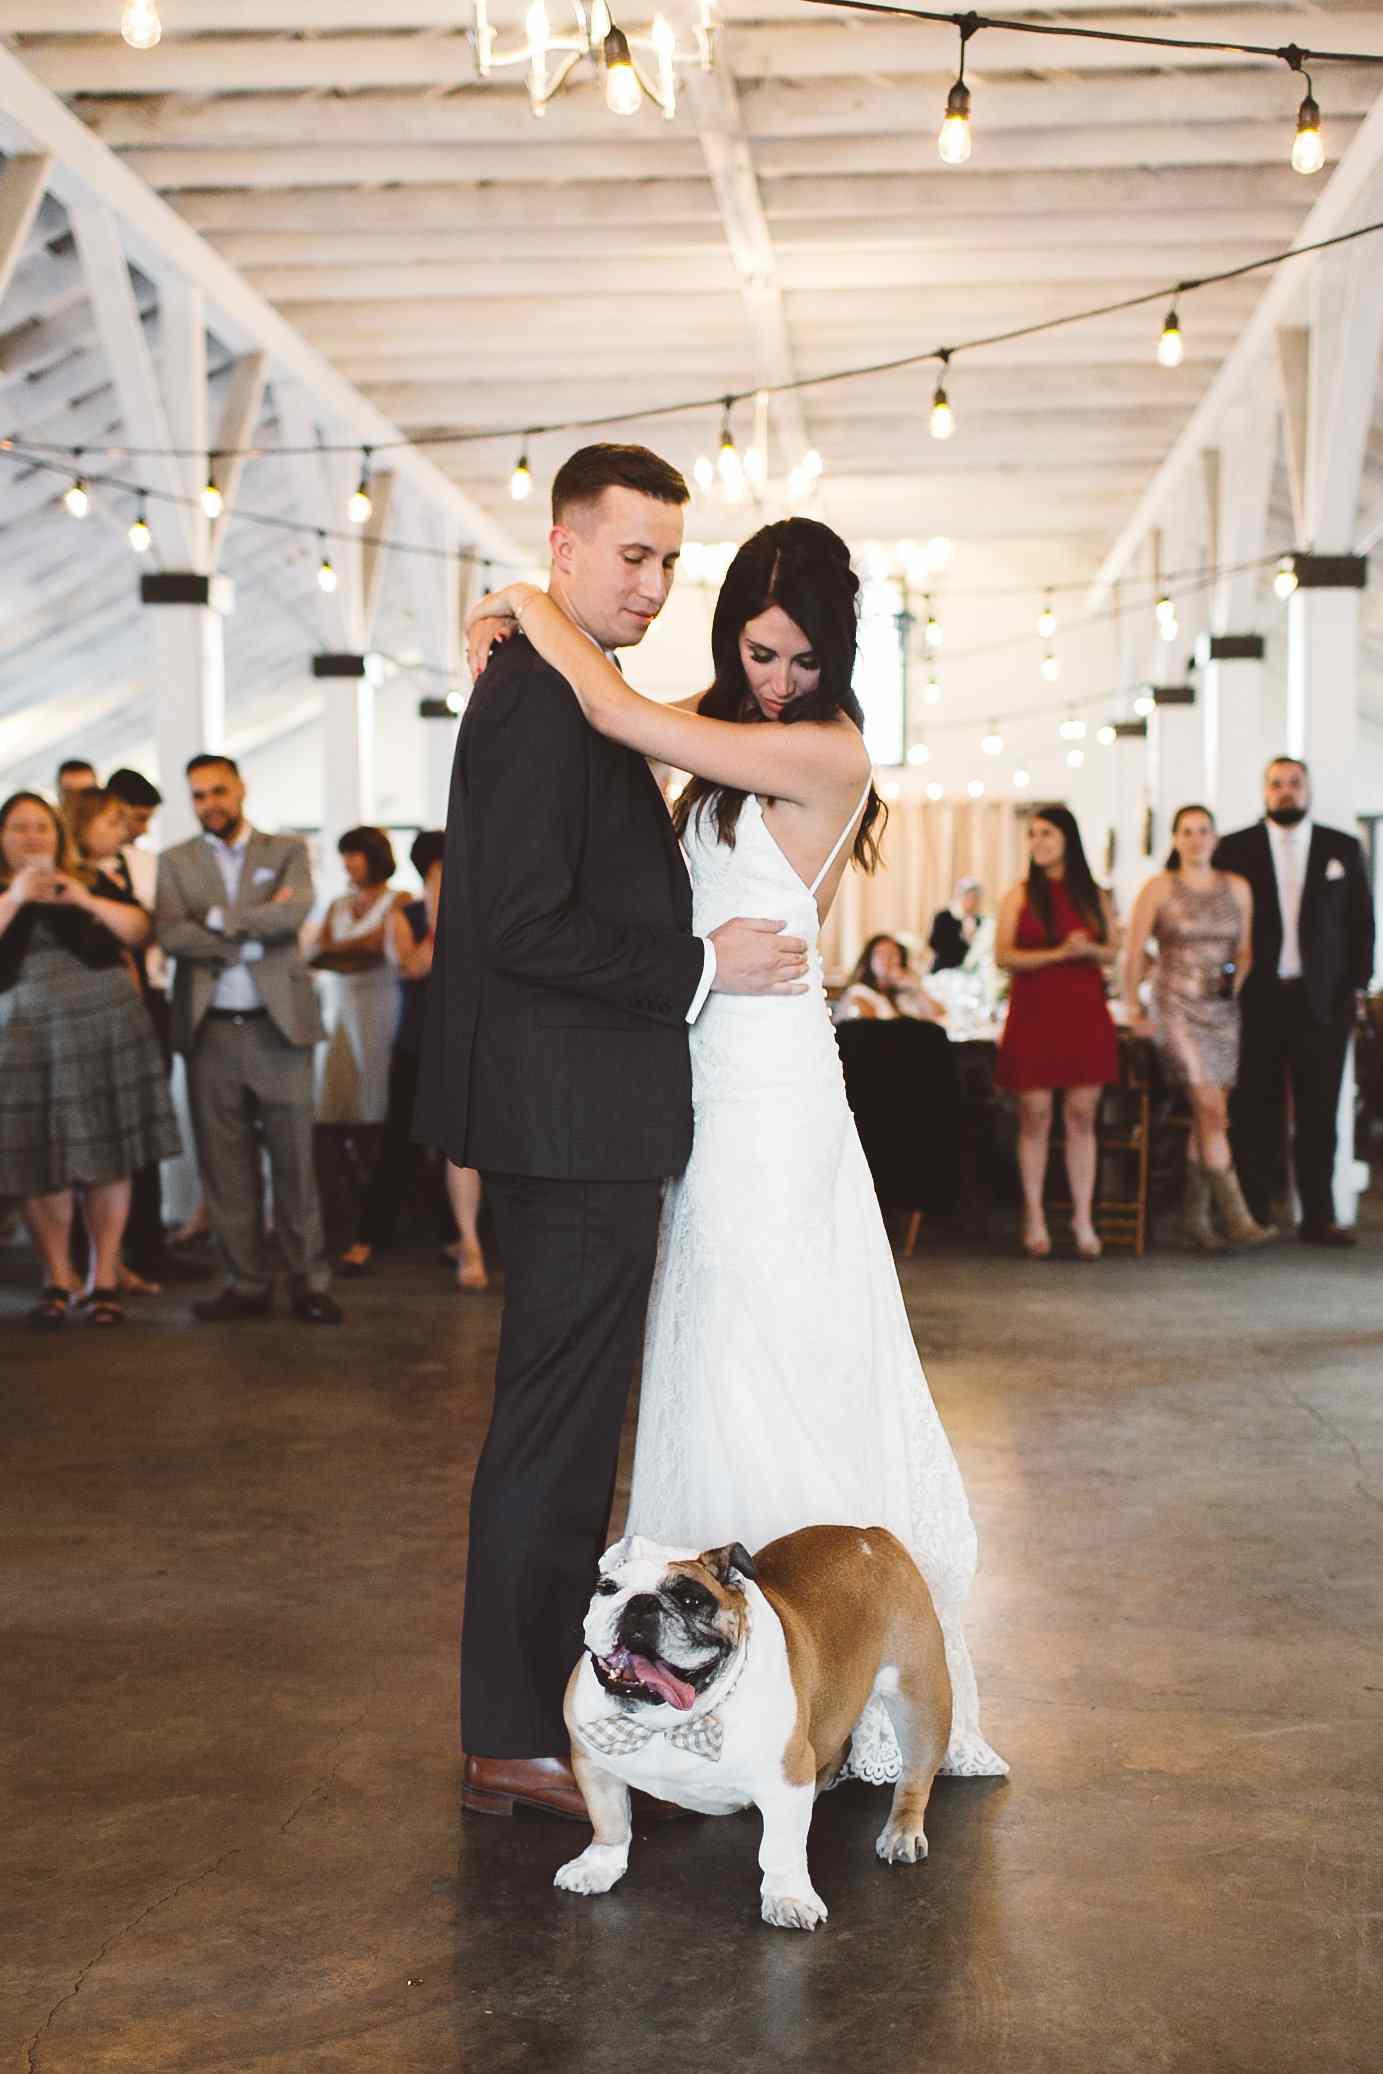 Newlyweds dancing with dog